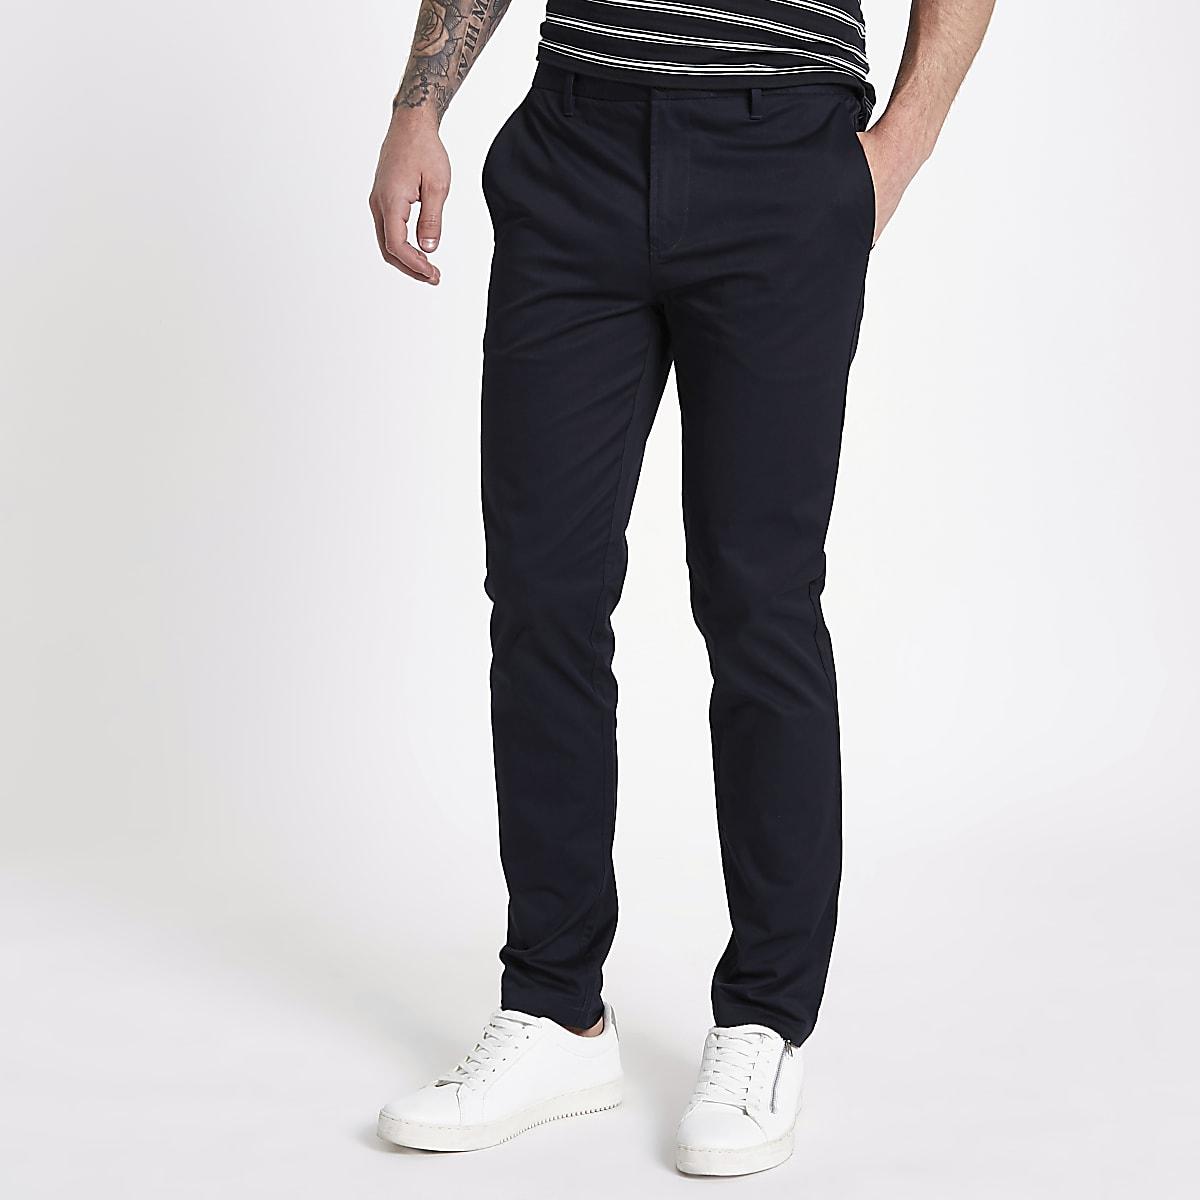 Navy slim fit chino pants